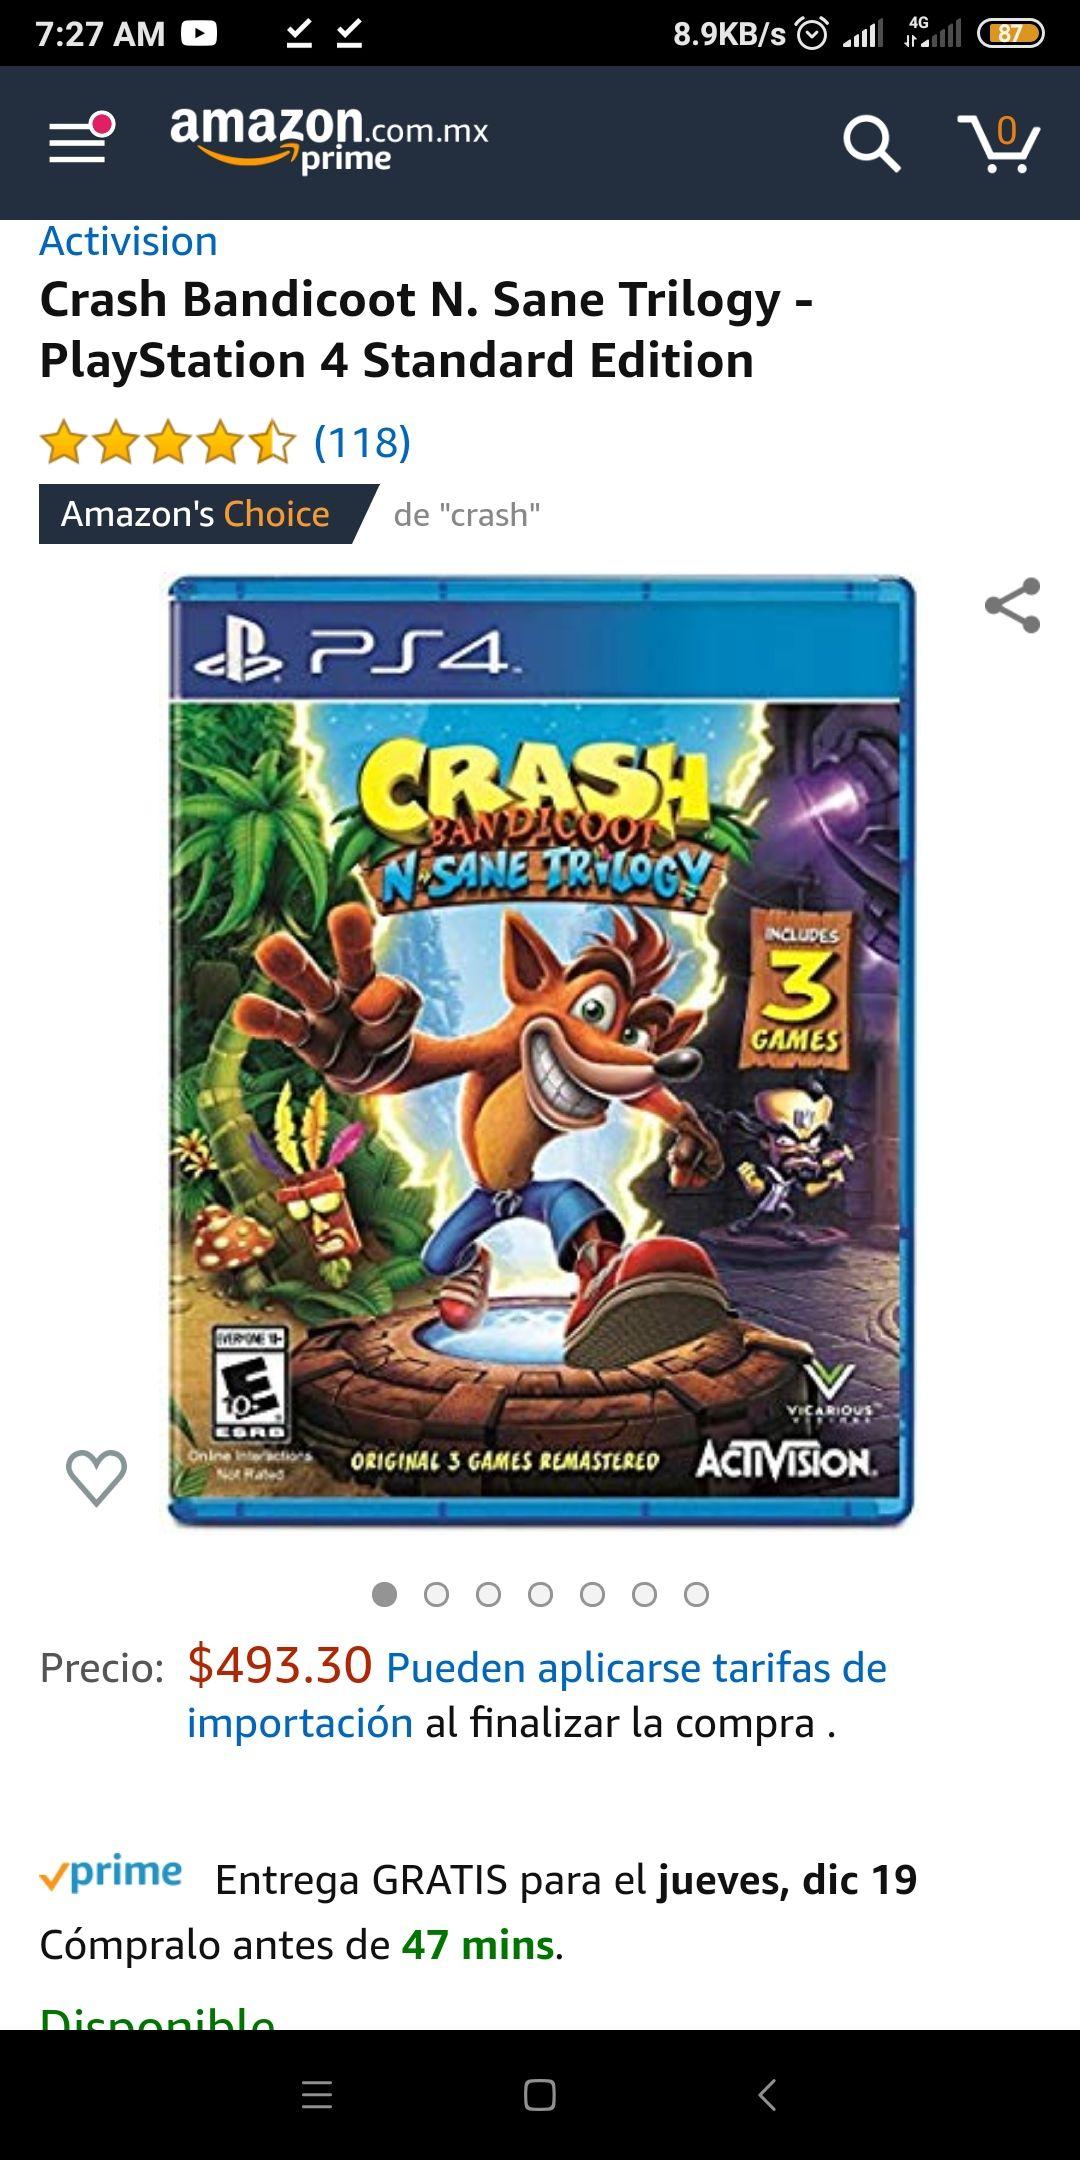 Amazon: Crash Bandicoot N. Sane Trilogy - PlayStation 4 Standard Edition